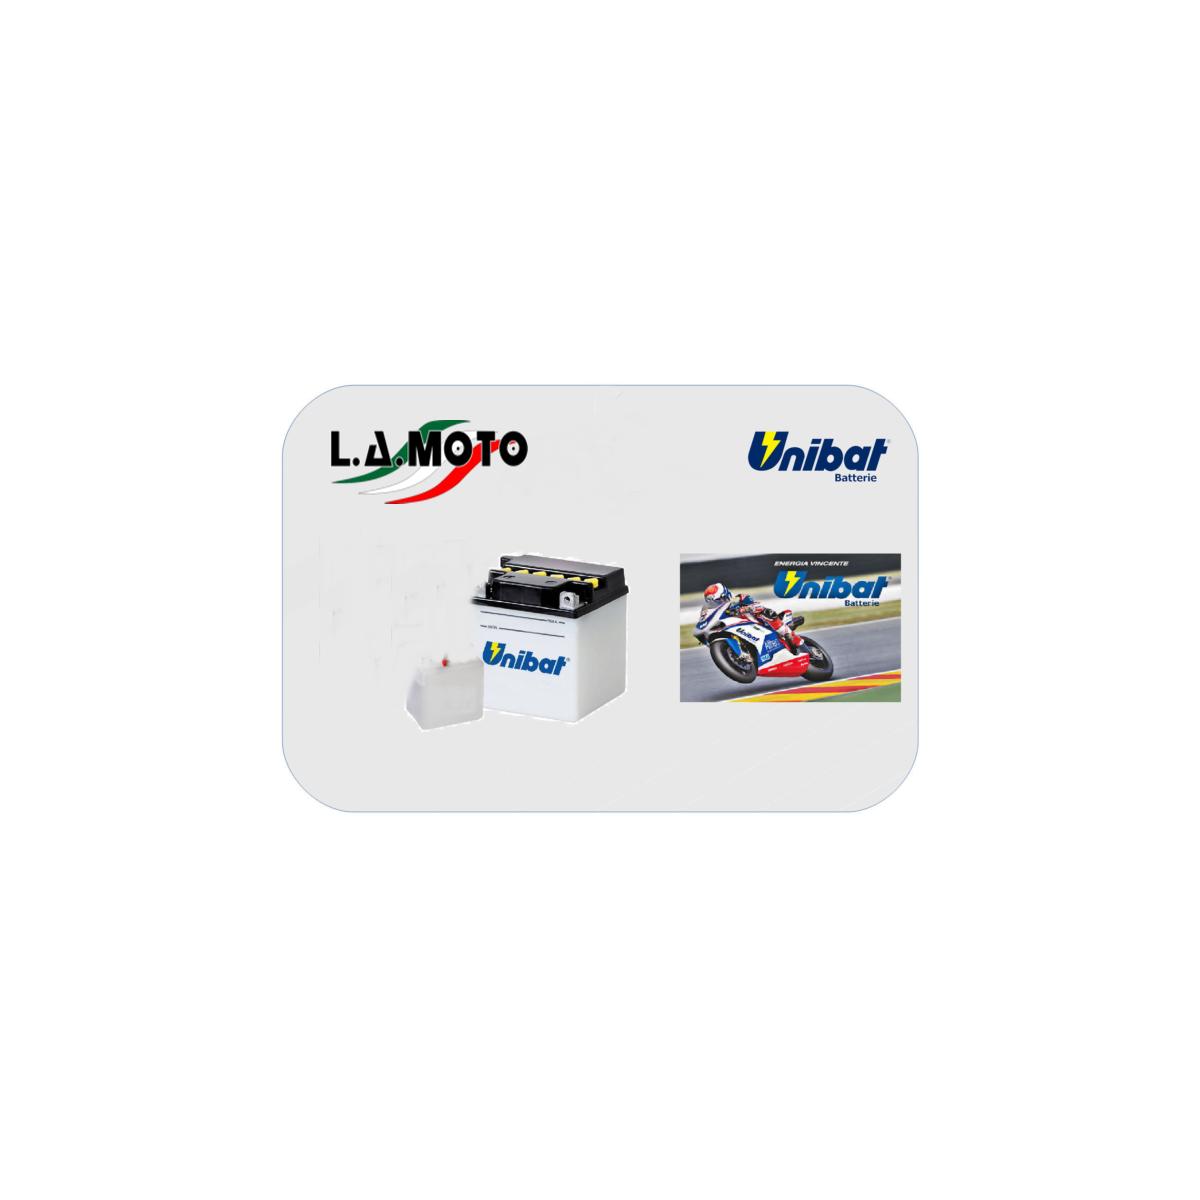 Batteria Moto UNIBAT  C60-n30l-a 30ah MotoGuzzi California III 1000 88-93